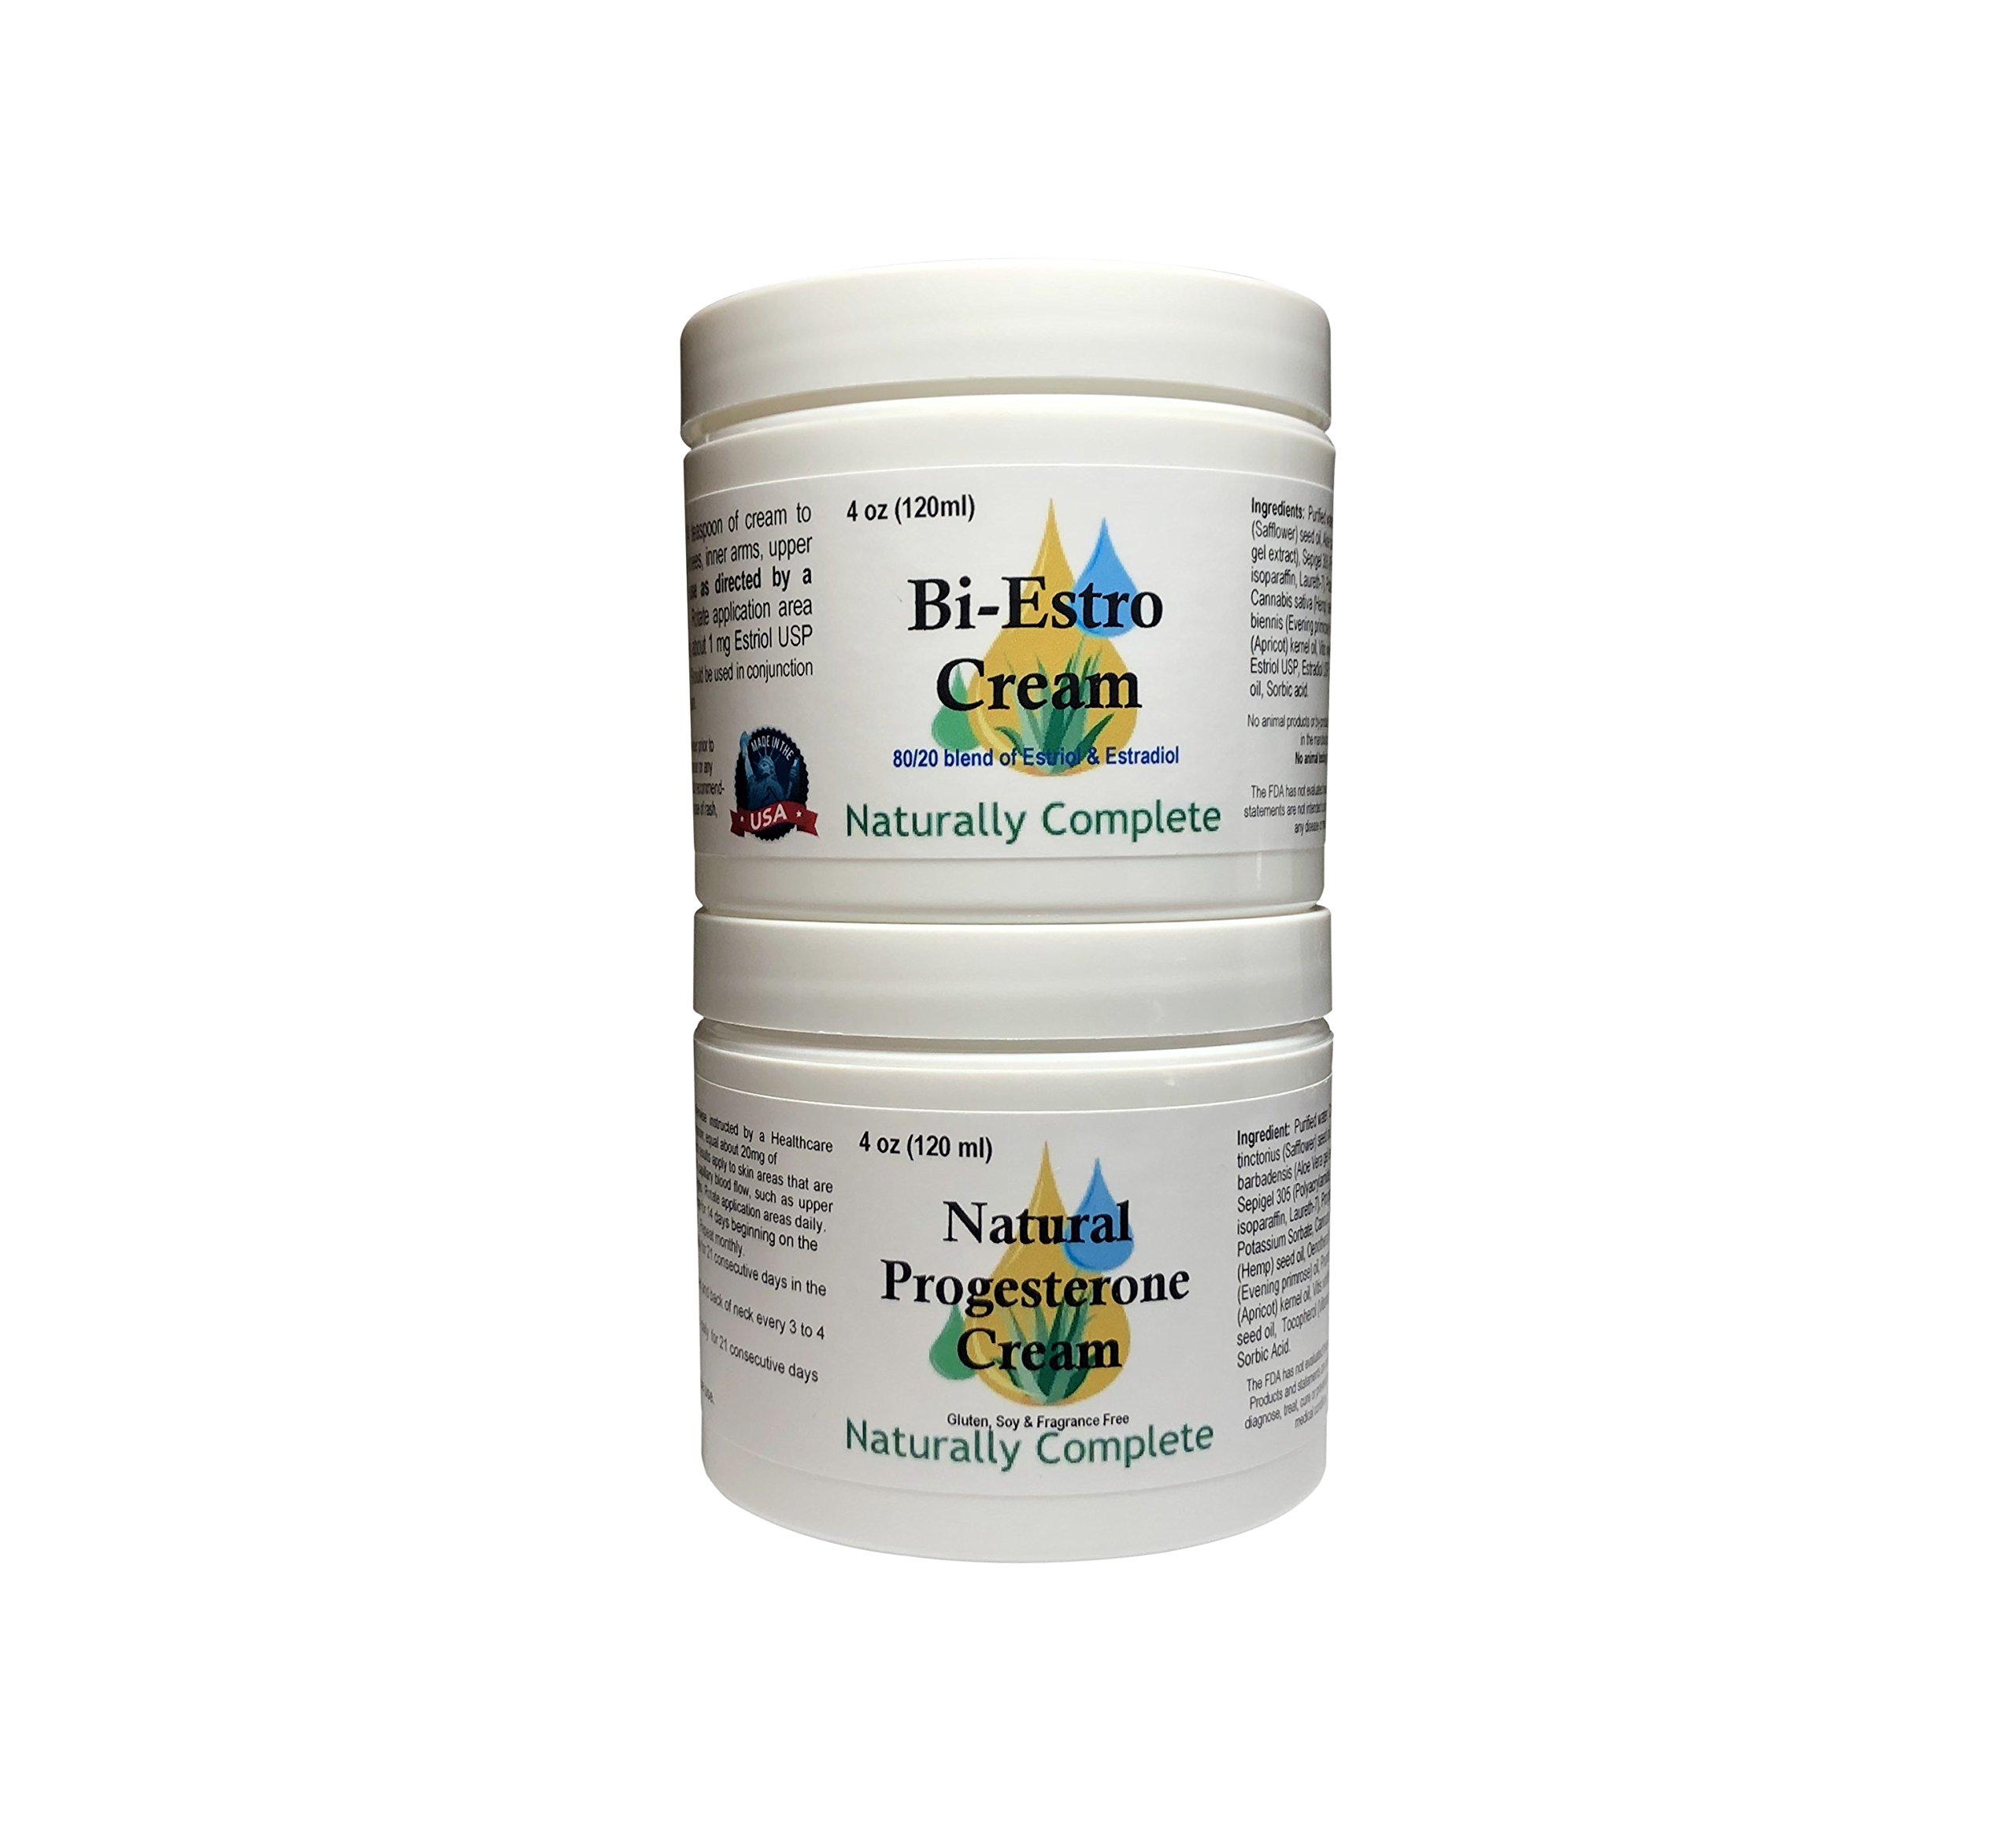 Naturally Complete Bi-Estro Pack | 1 Bi-Estro 4 oz Jar and 1 Progesterone 4 oz Jar | 2 Natural Menopause Products in One